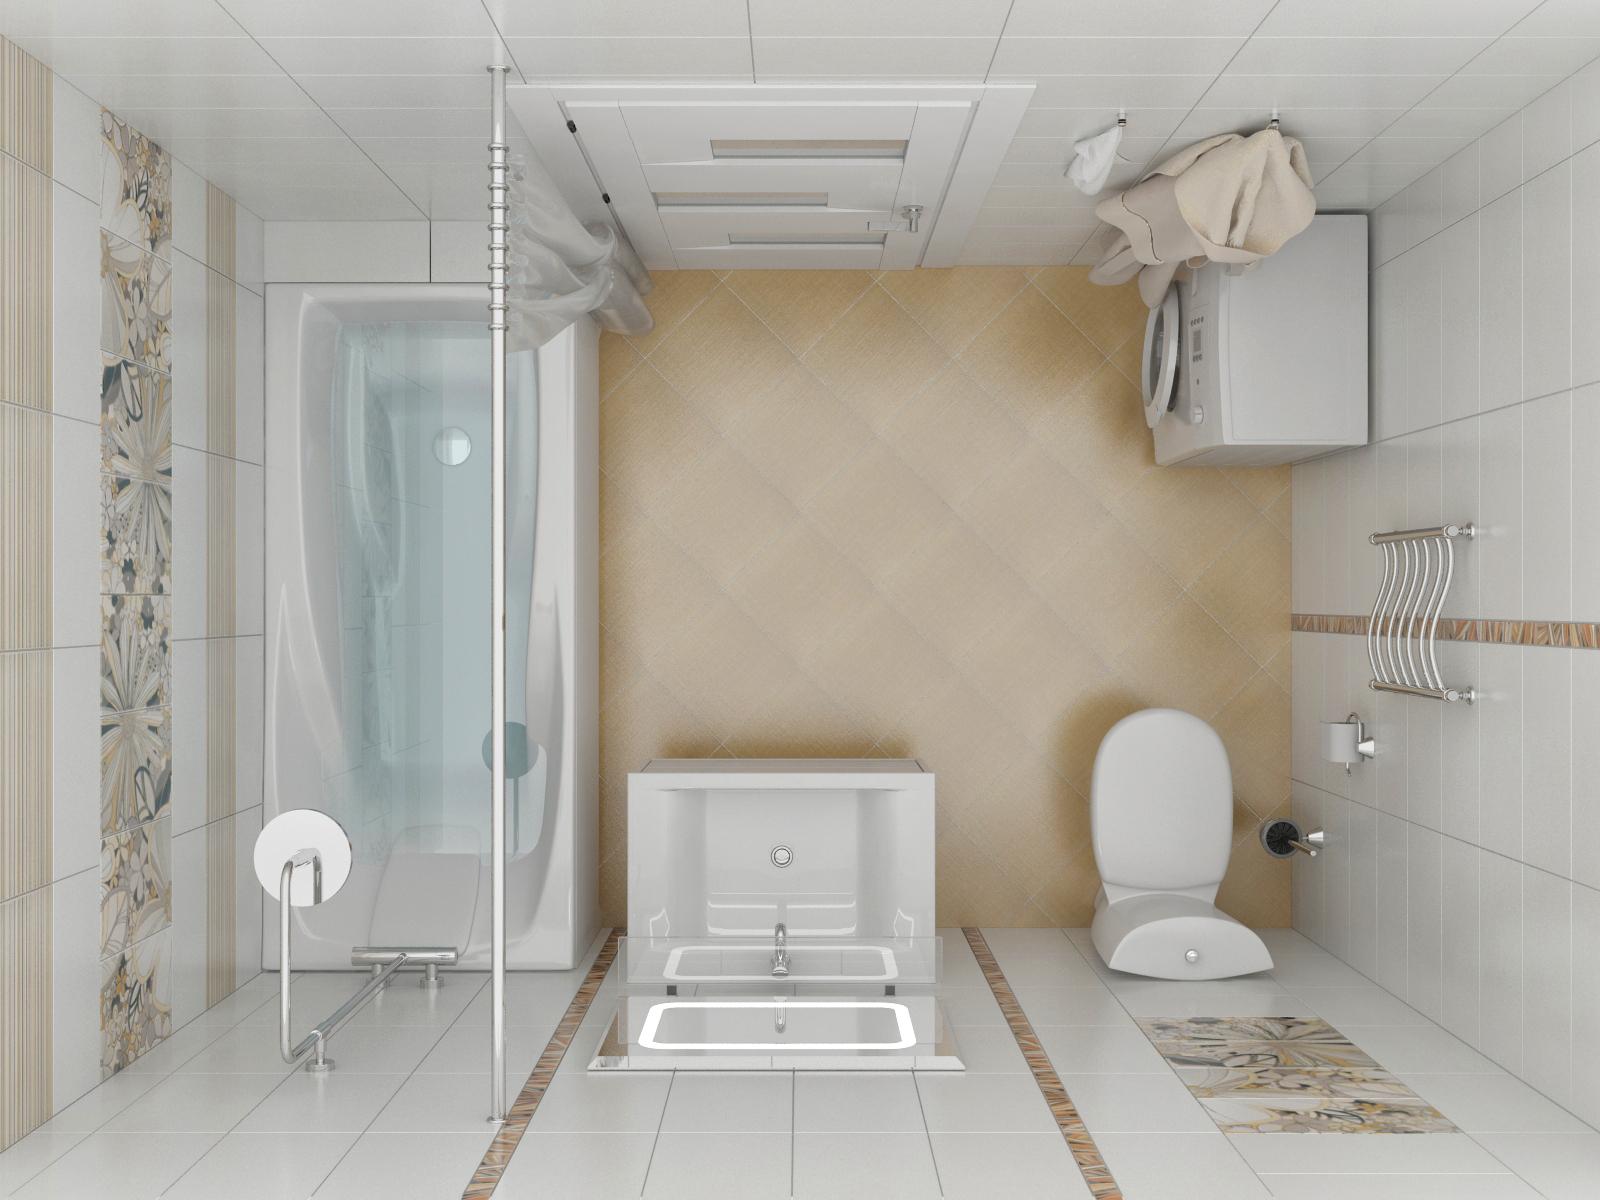 Дизайн ванной комнаты виды